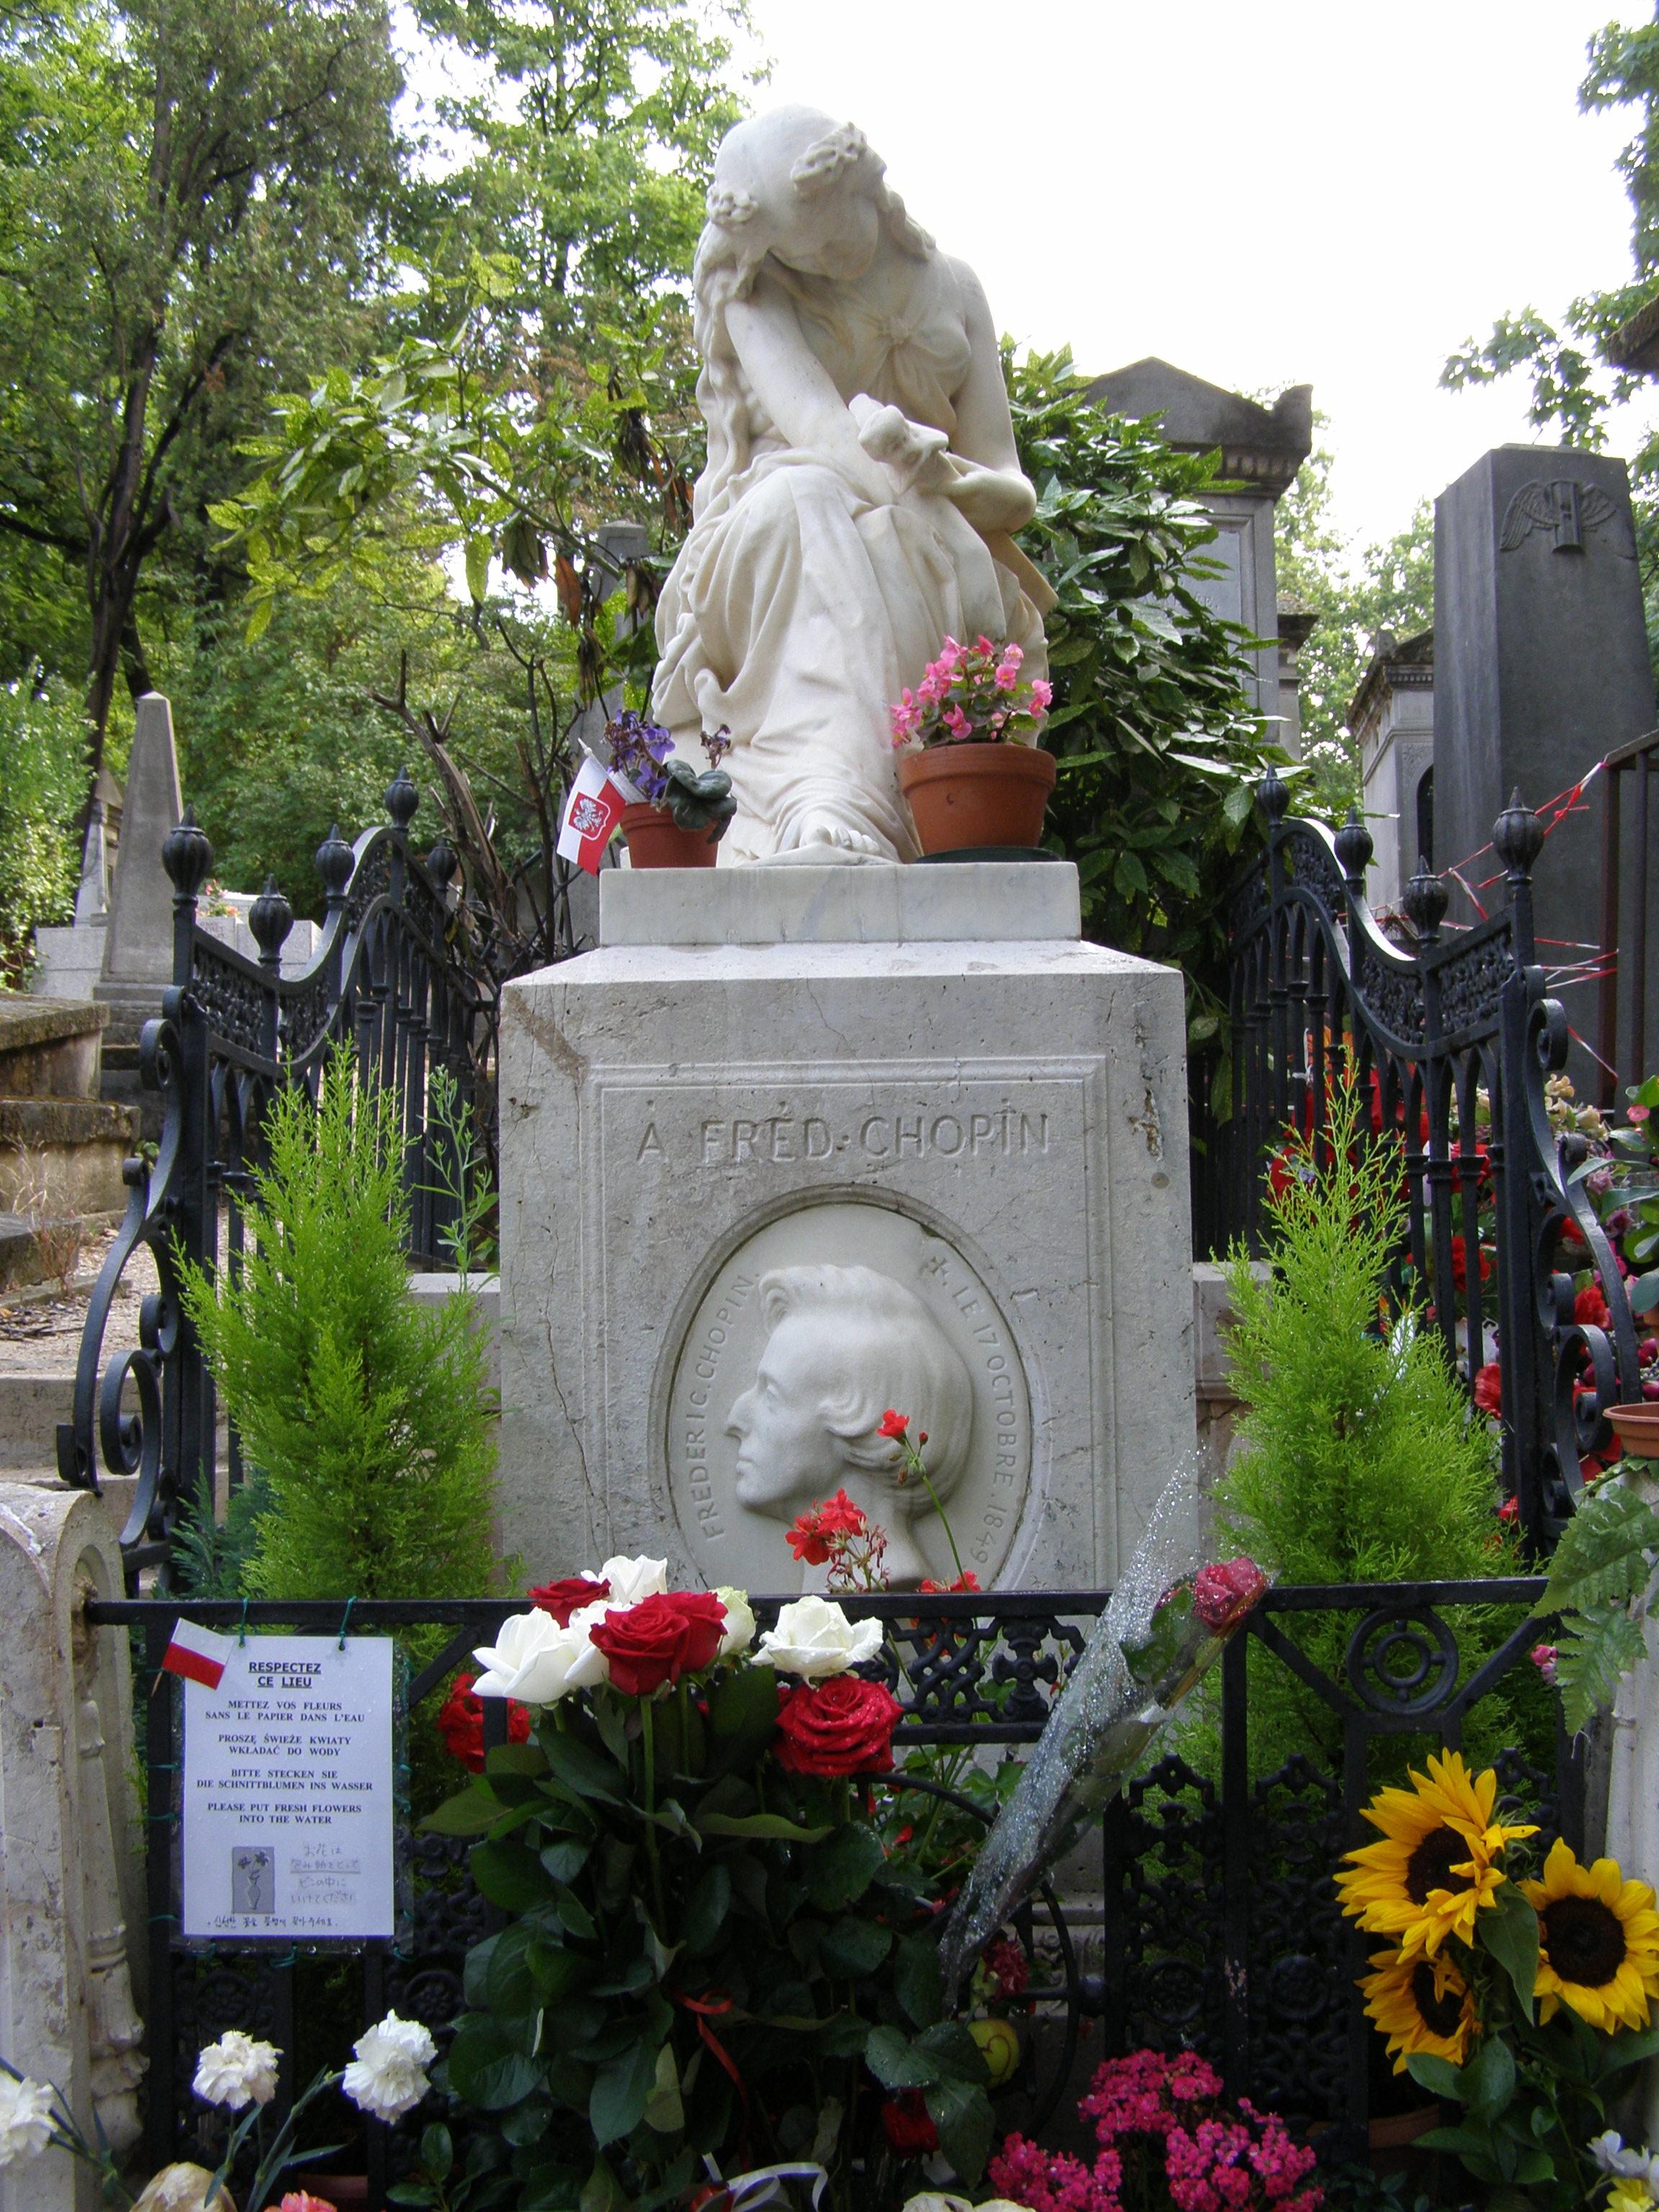 Fotos gratis rbol flor par s francia cementerio for Cementerio jardin memorial